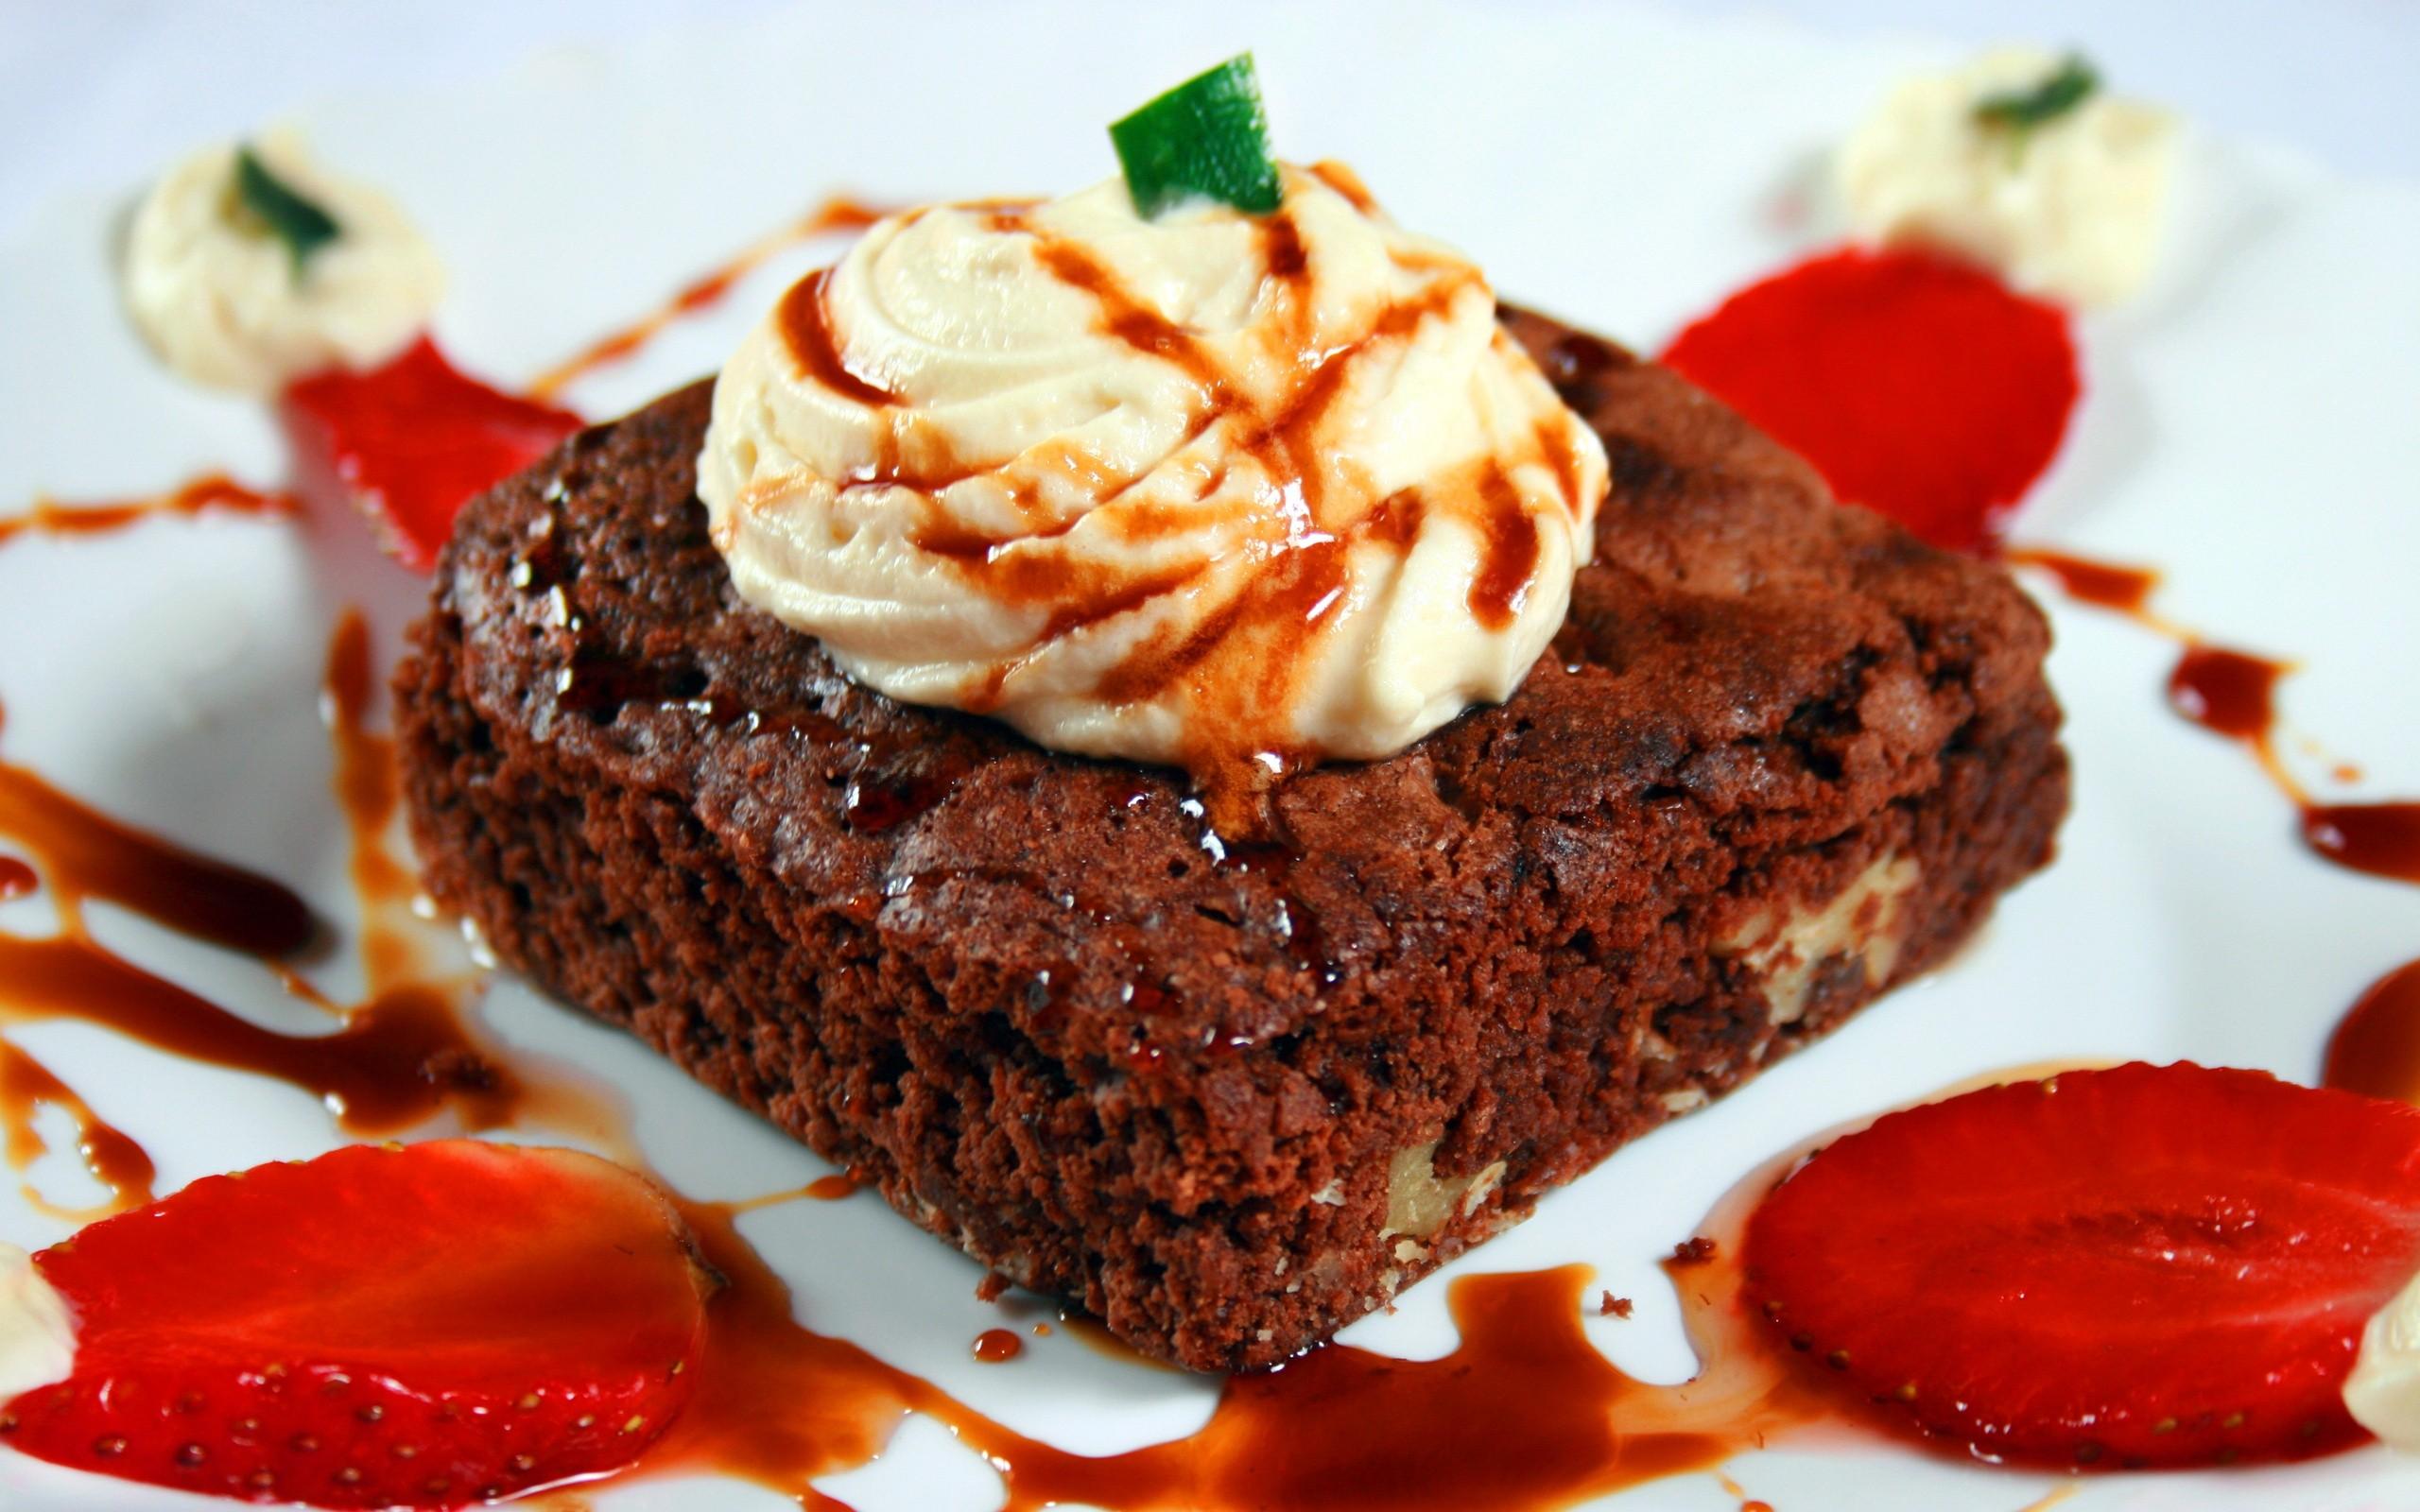 Strawberry Ice Cream Cake Tasty